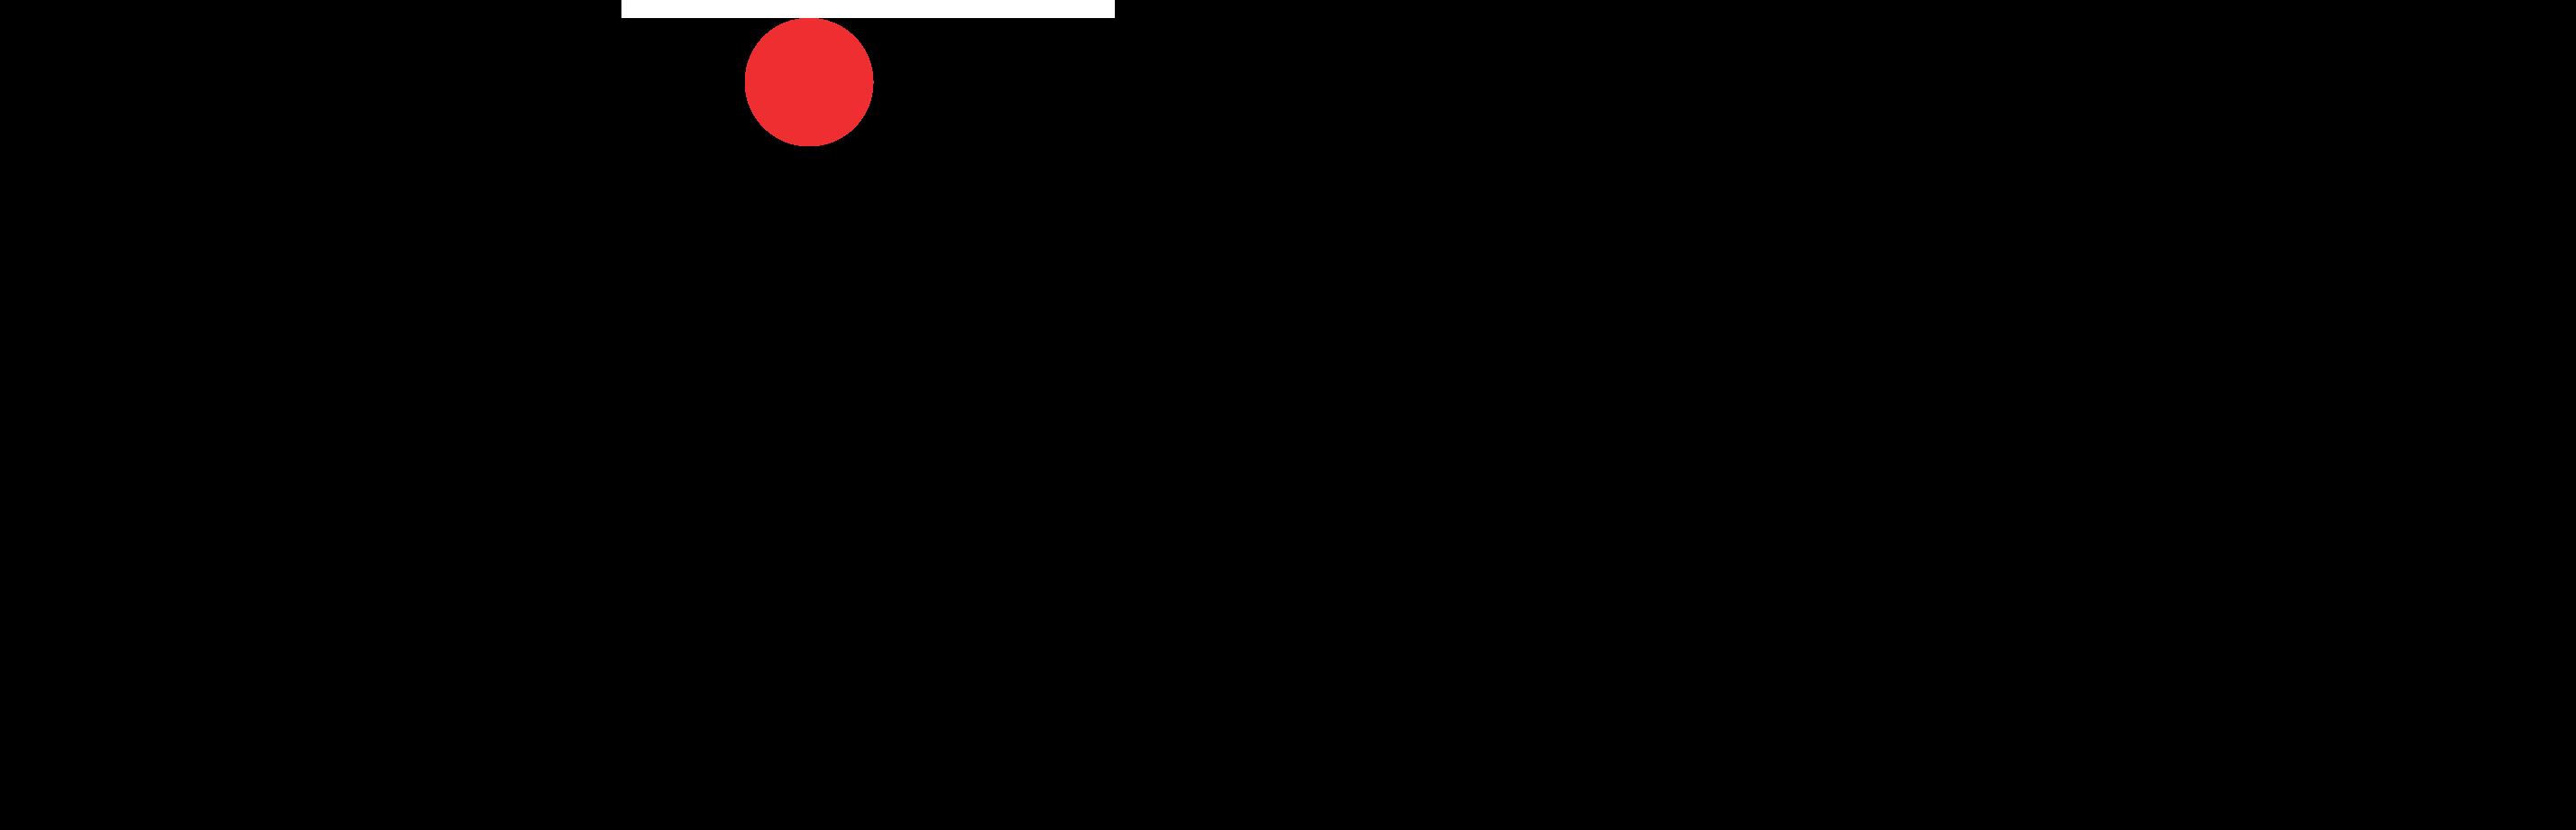 image gallery thinkpad logo